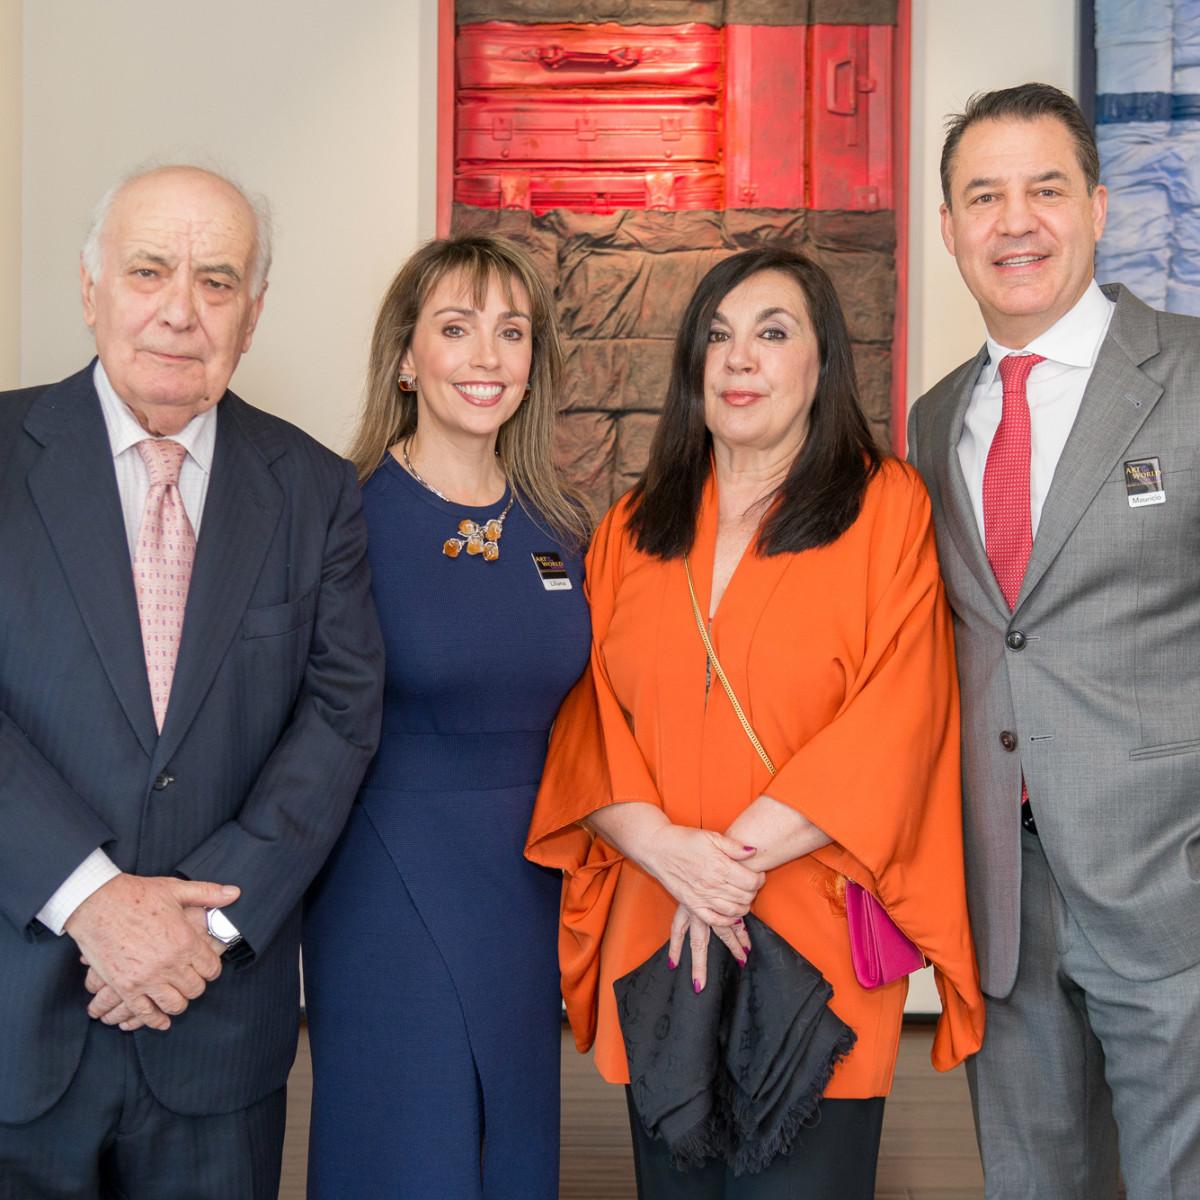 Cristobal Toral, Liliana Molina, Marisa Oropesa, and Mauricio Vallejo